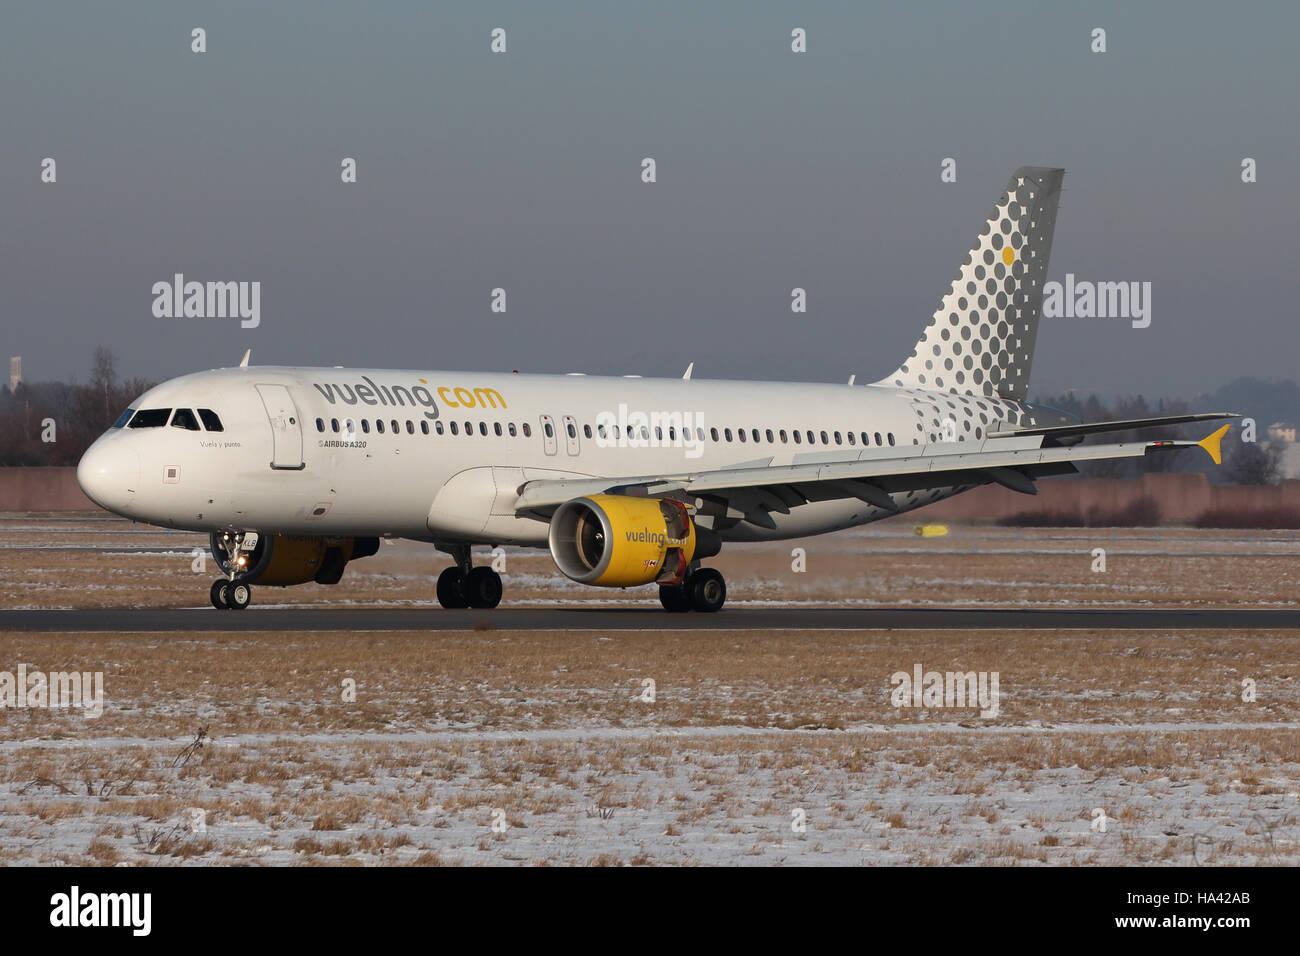 Stuttgart, Germany – January 20, 2016: Vueling, Airbus A320 at Stuttgart Airport - Stock Image